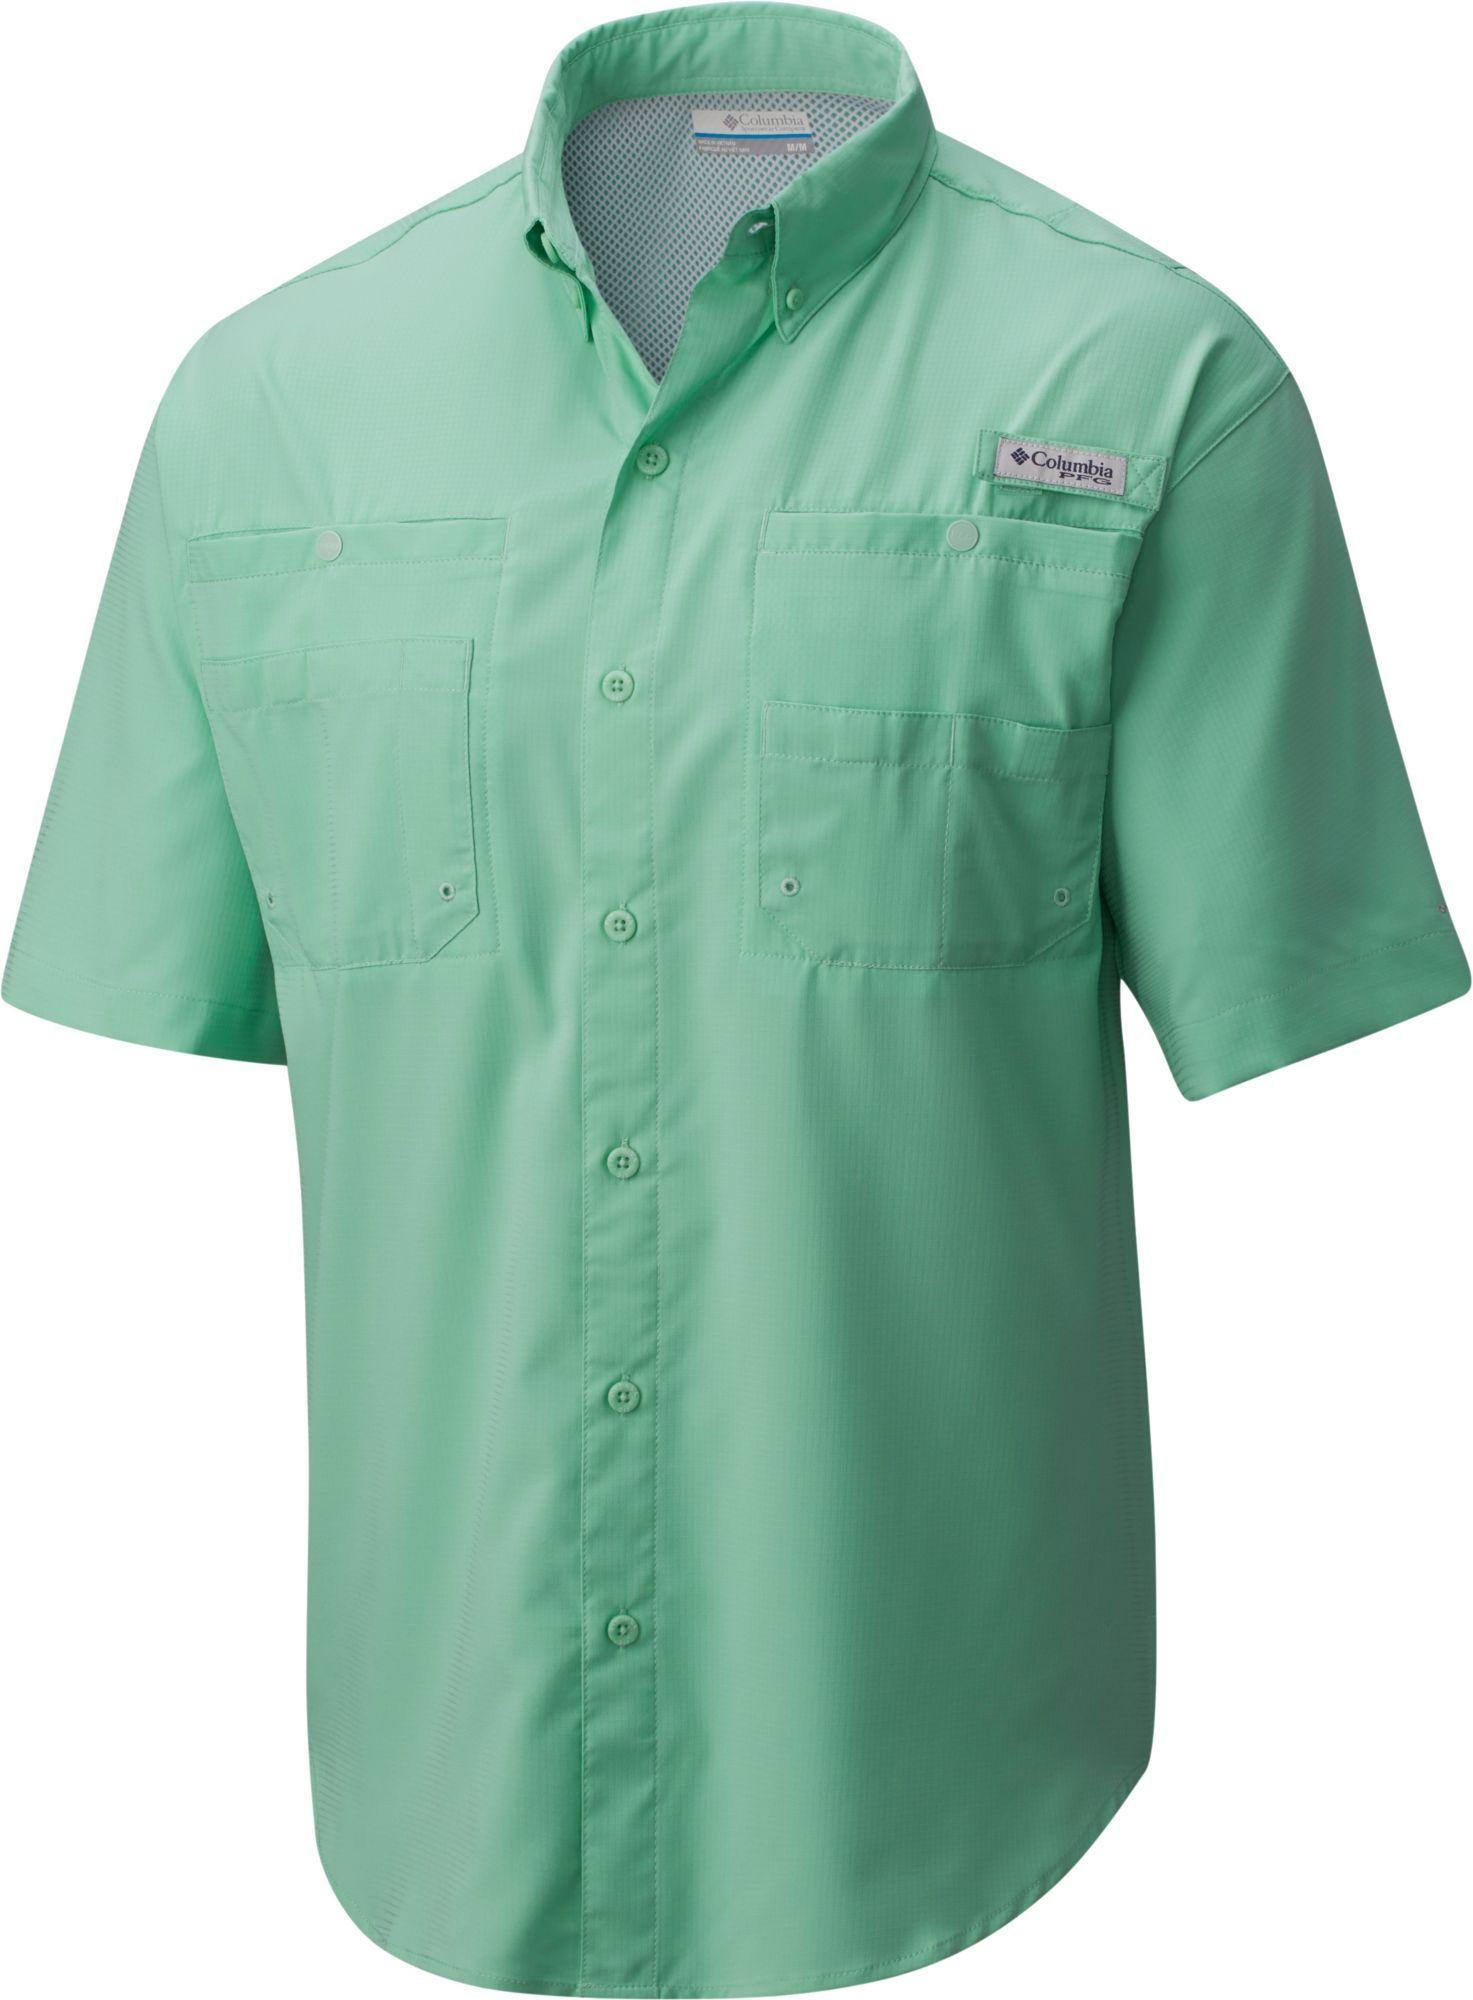 7fd8d40f28a Columbia Men's PFG Tamiami II Shirt | Products | Shirts, Columbia ...